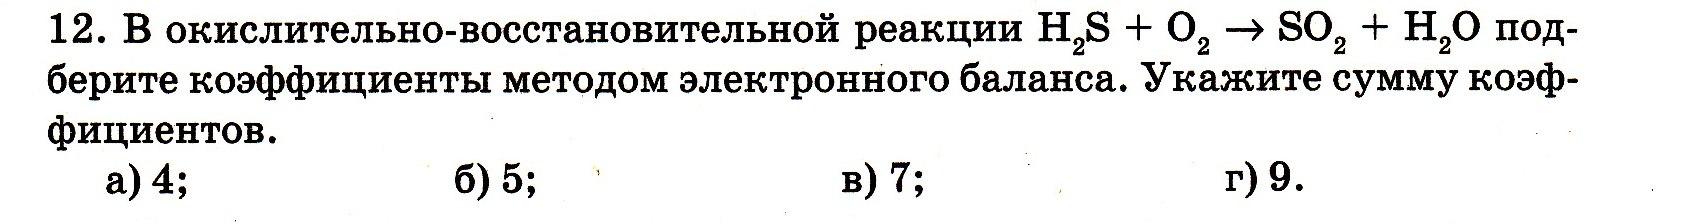 lf9VHlzdgqU.jpg